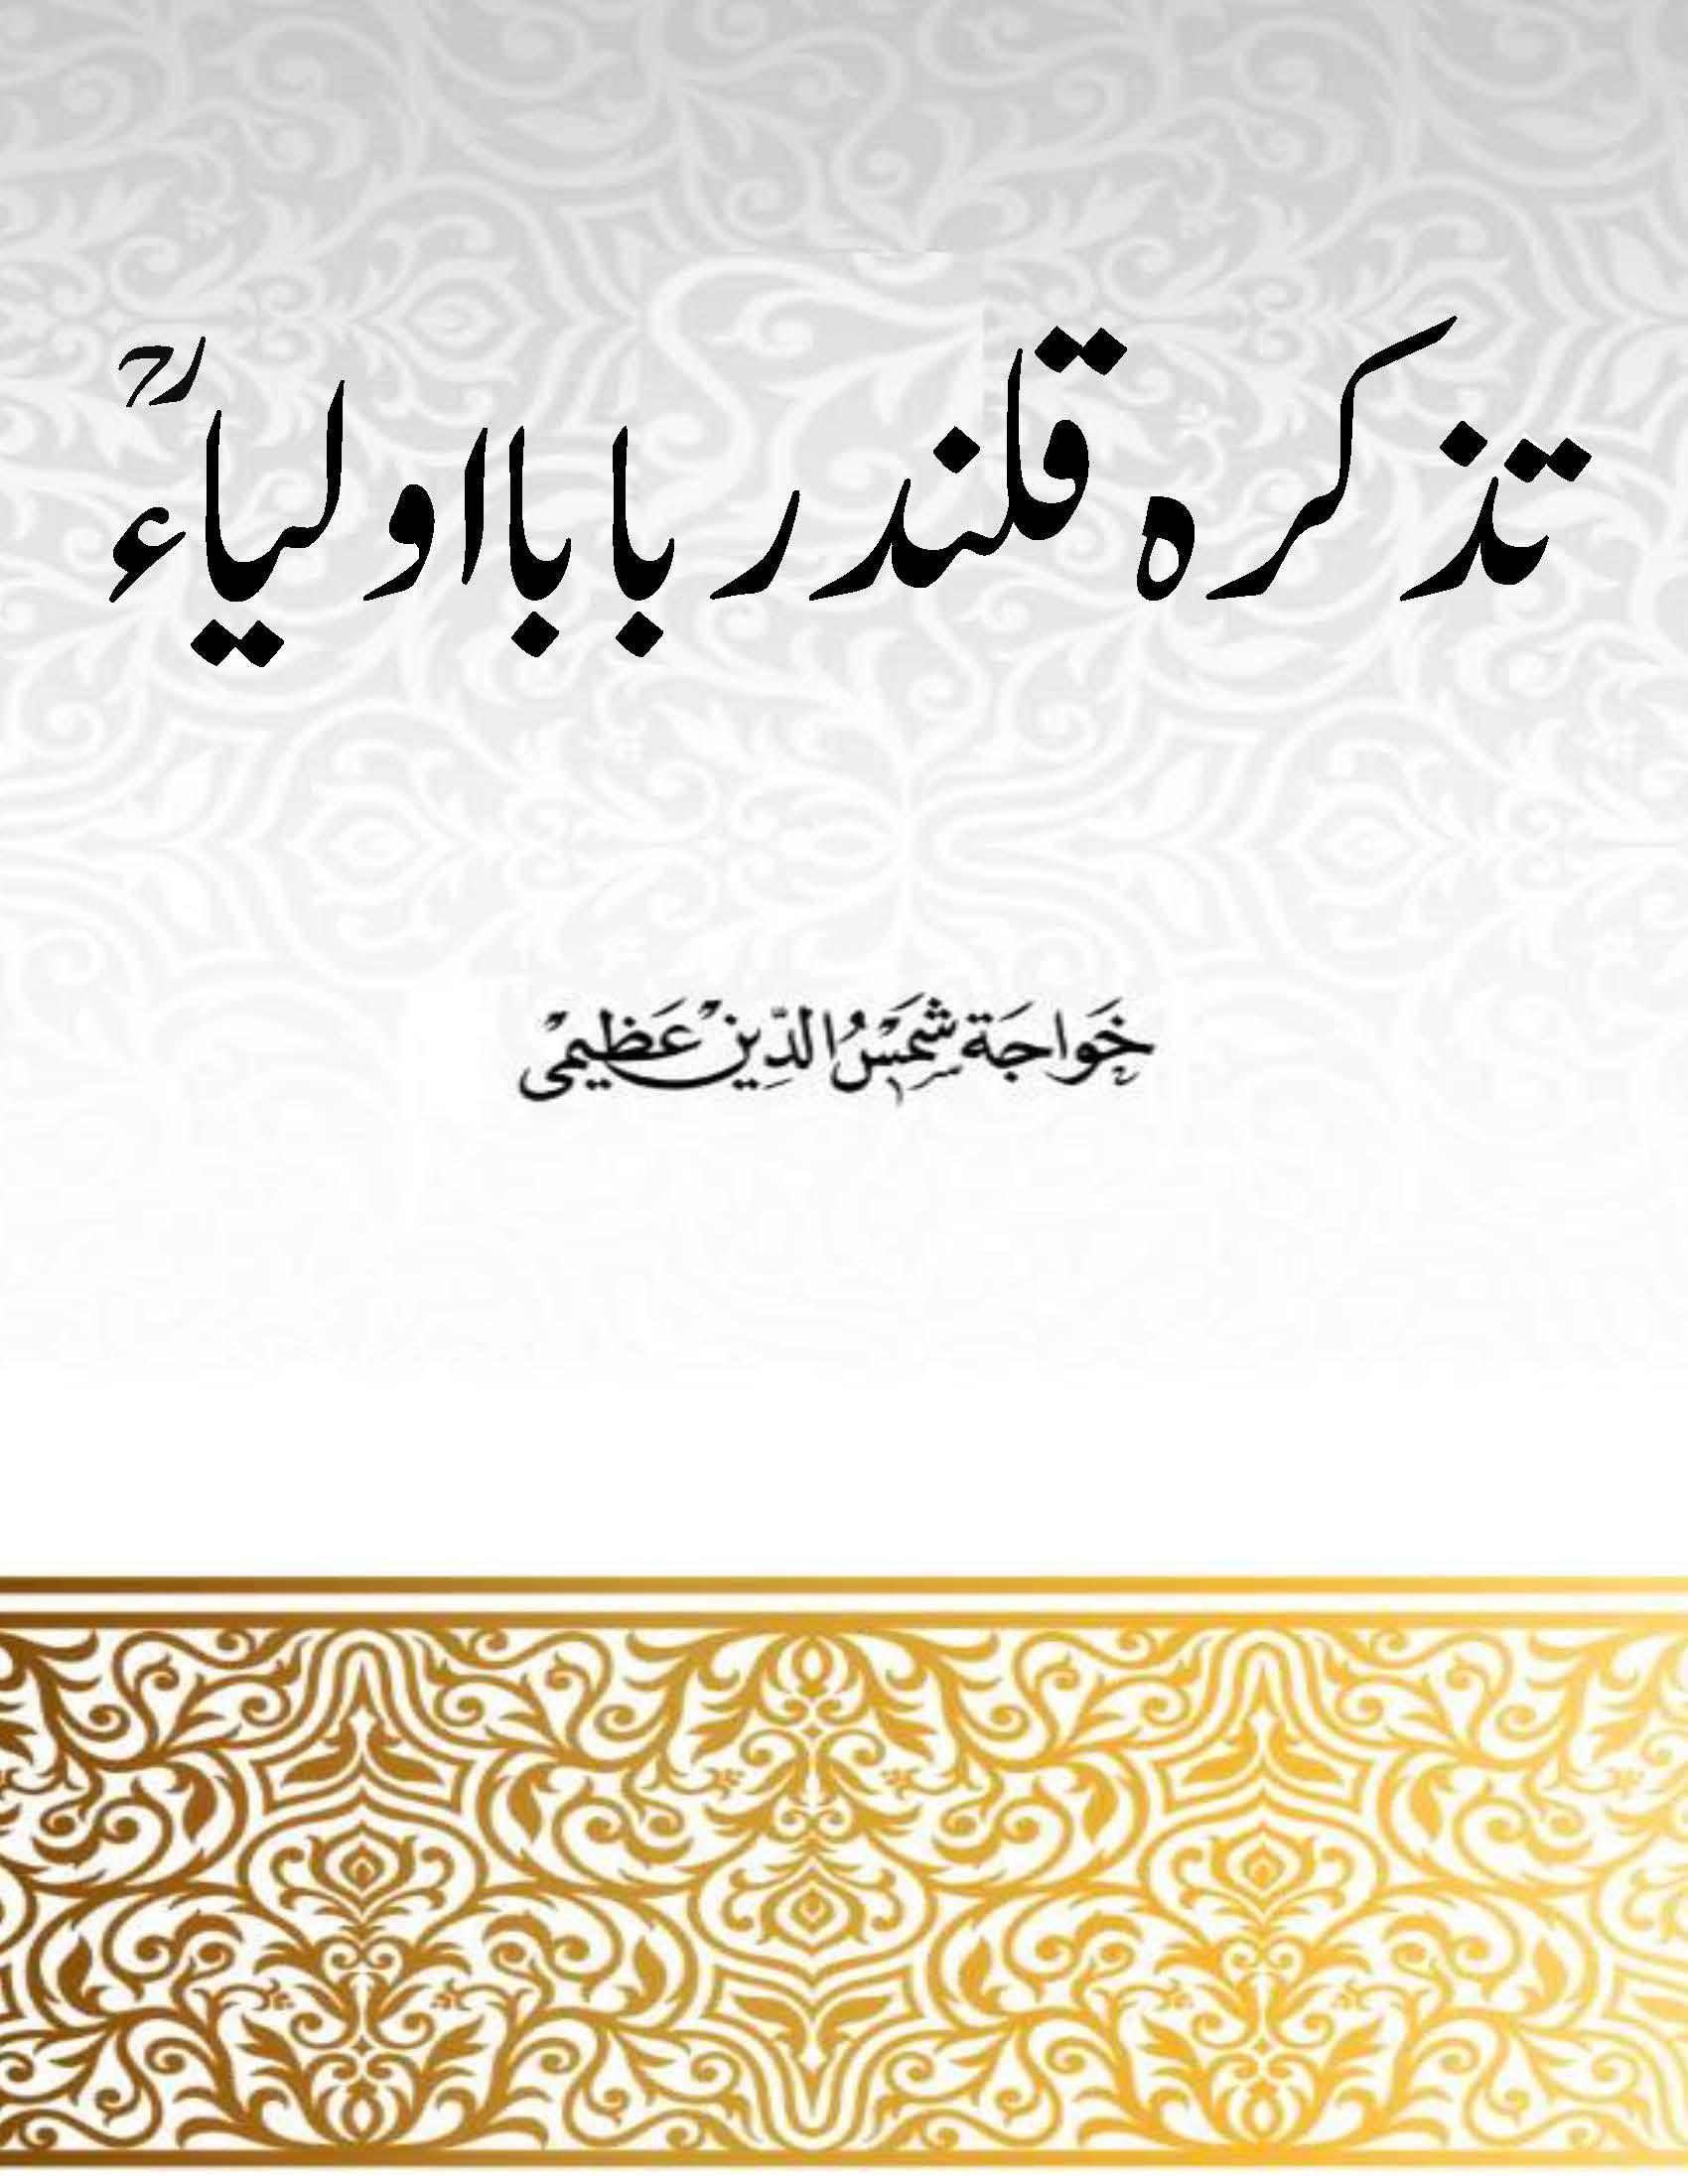 Tazkira Qalandar Baba Aulia